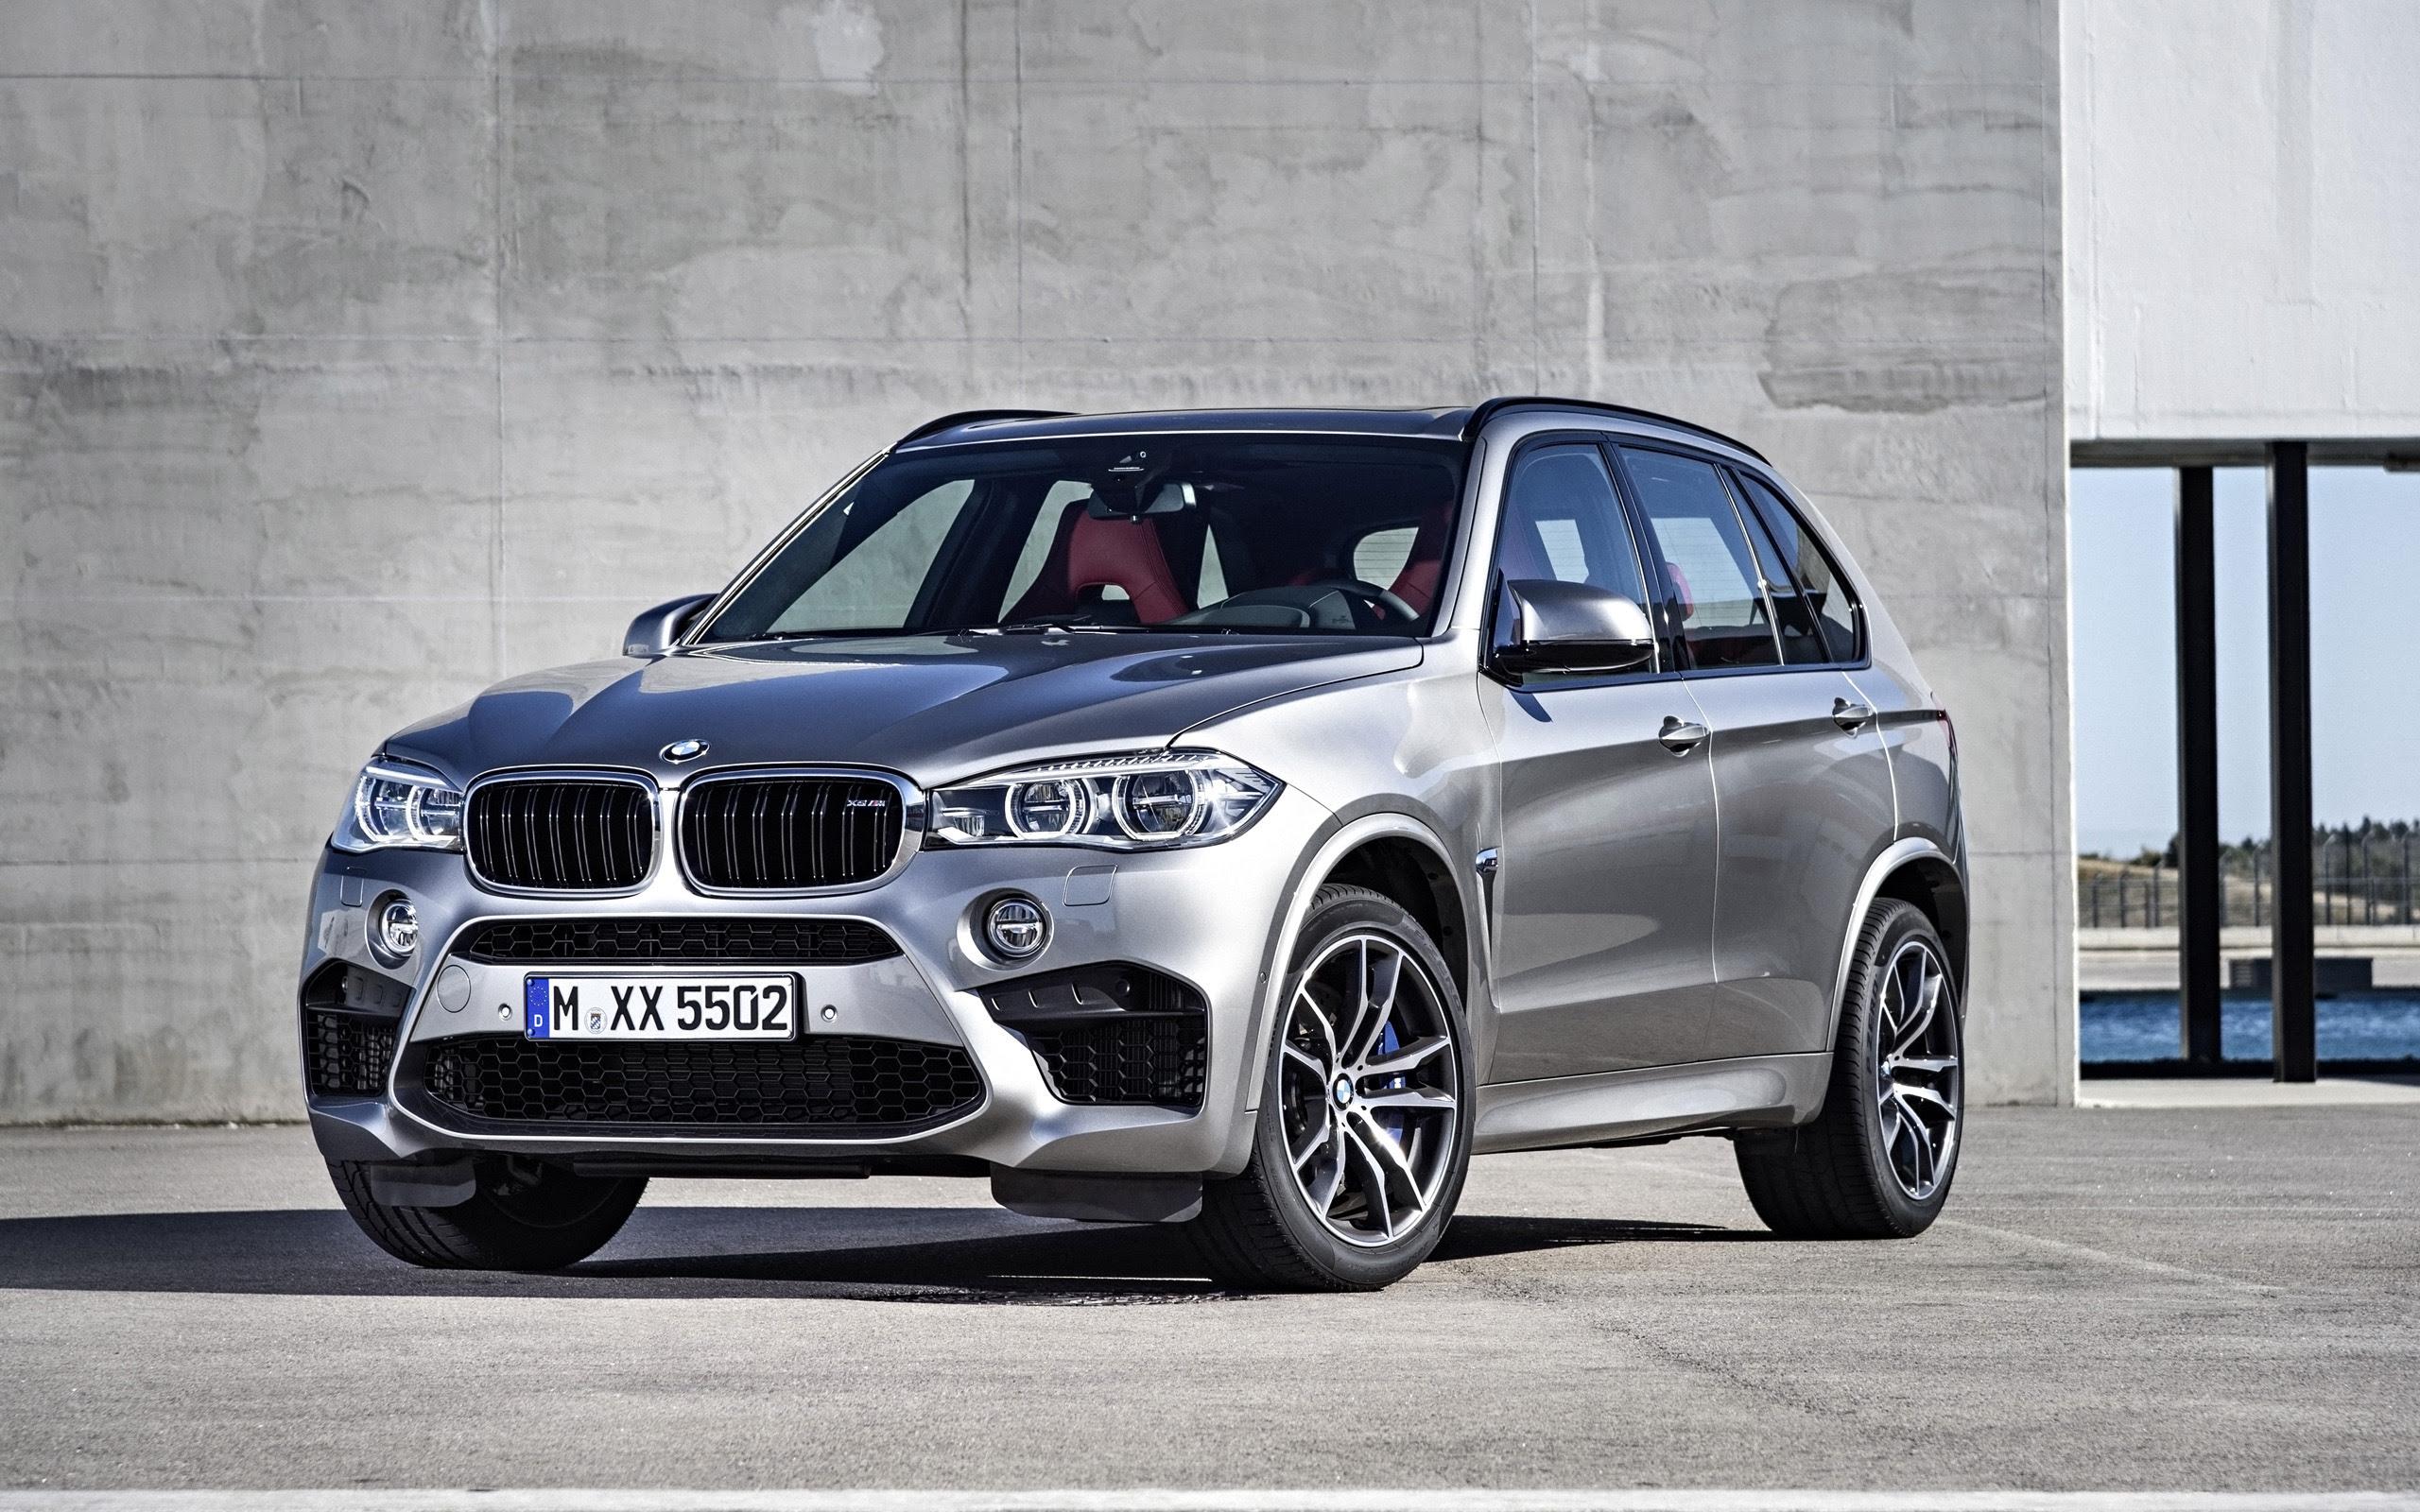 2015 BMW X5 M Wallpaper | HD Car Wallpapers